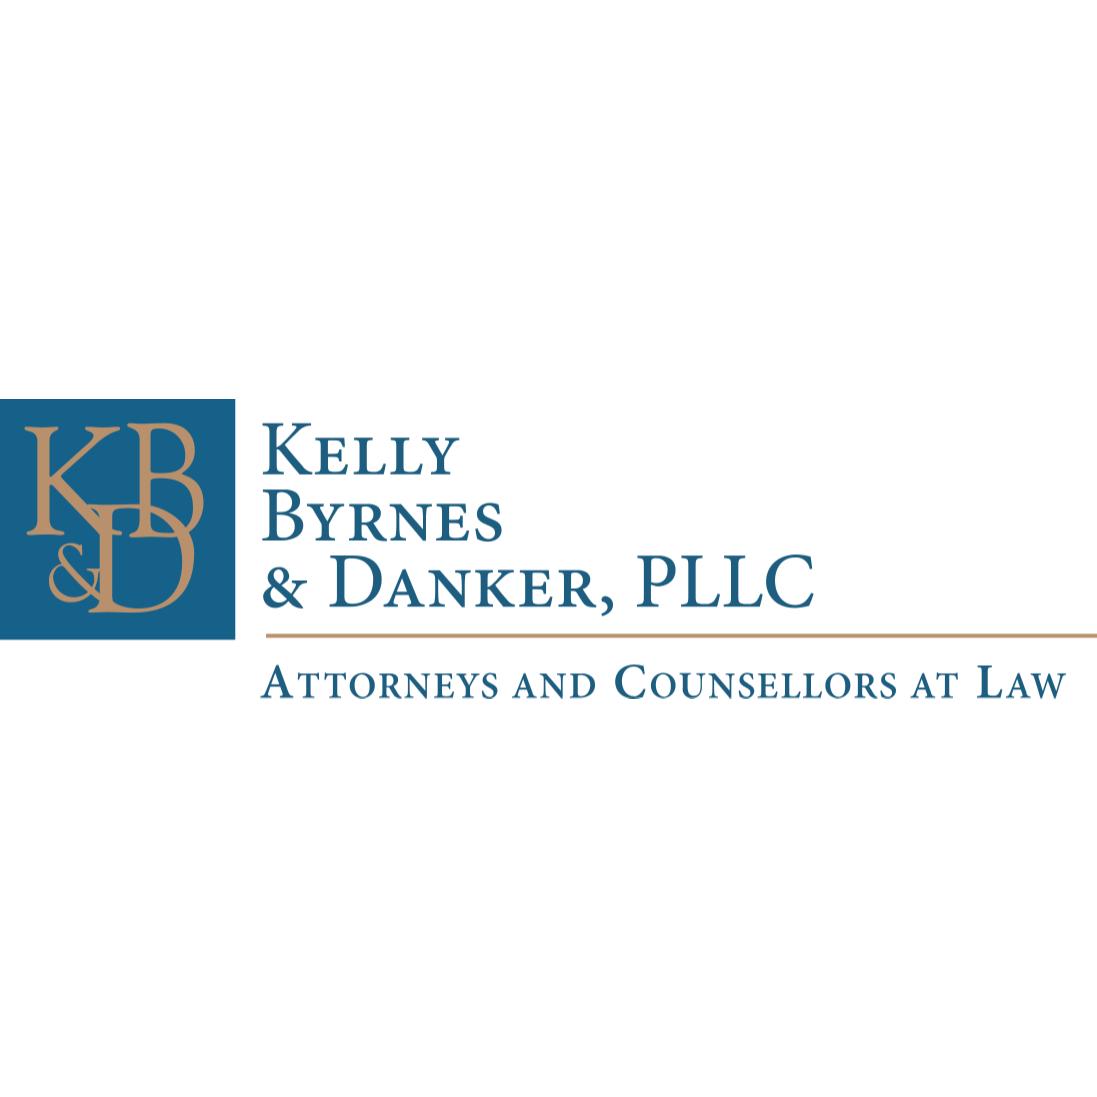 Kelly Byrnes & Danker, PLLC - Leesburg, VA 20175 - (703)224-0888 | ShowMeLocal.com